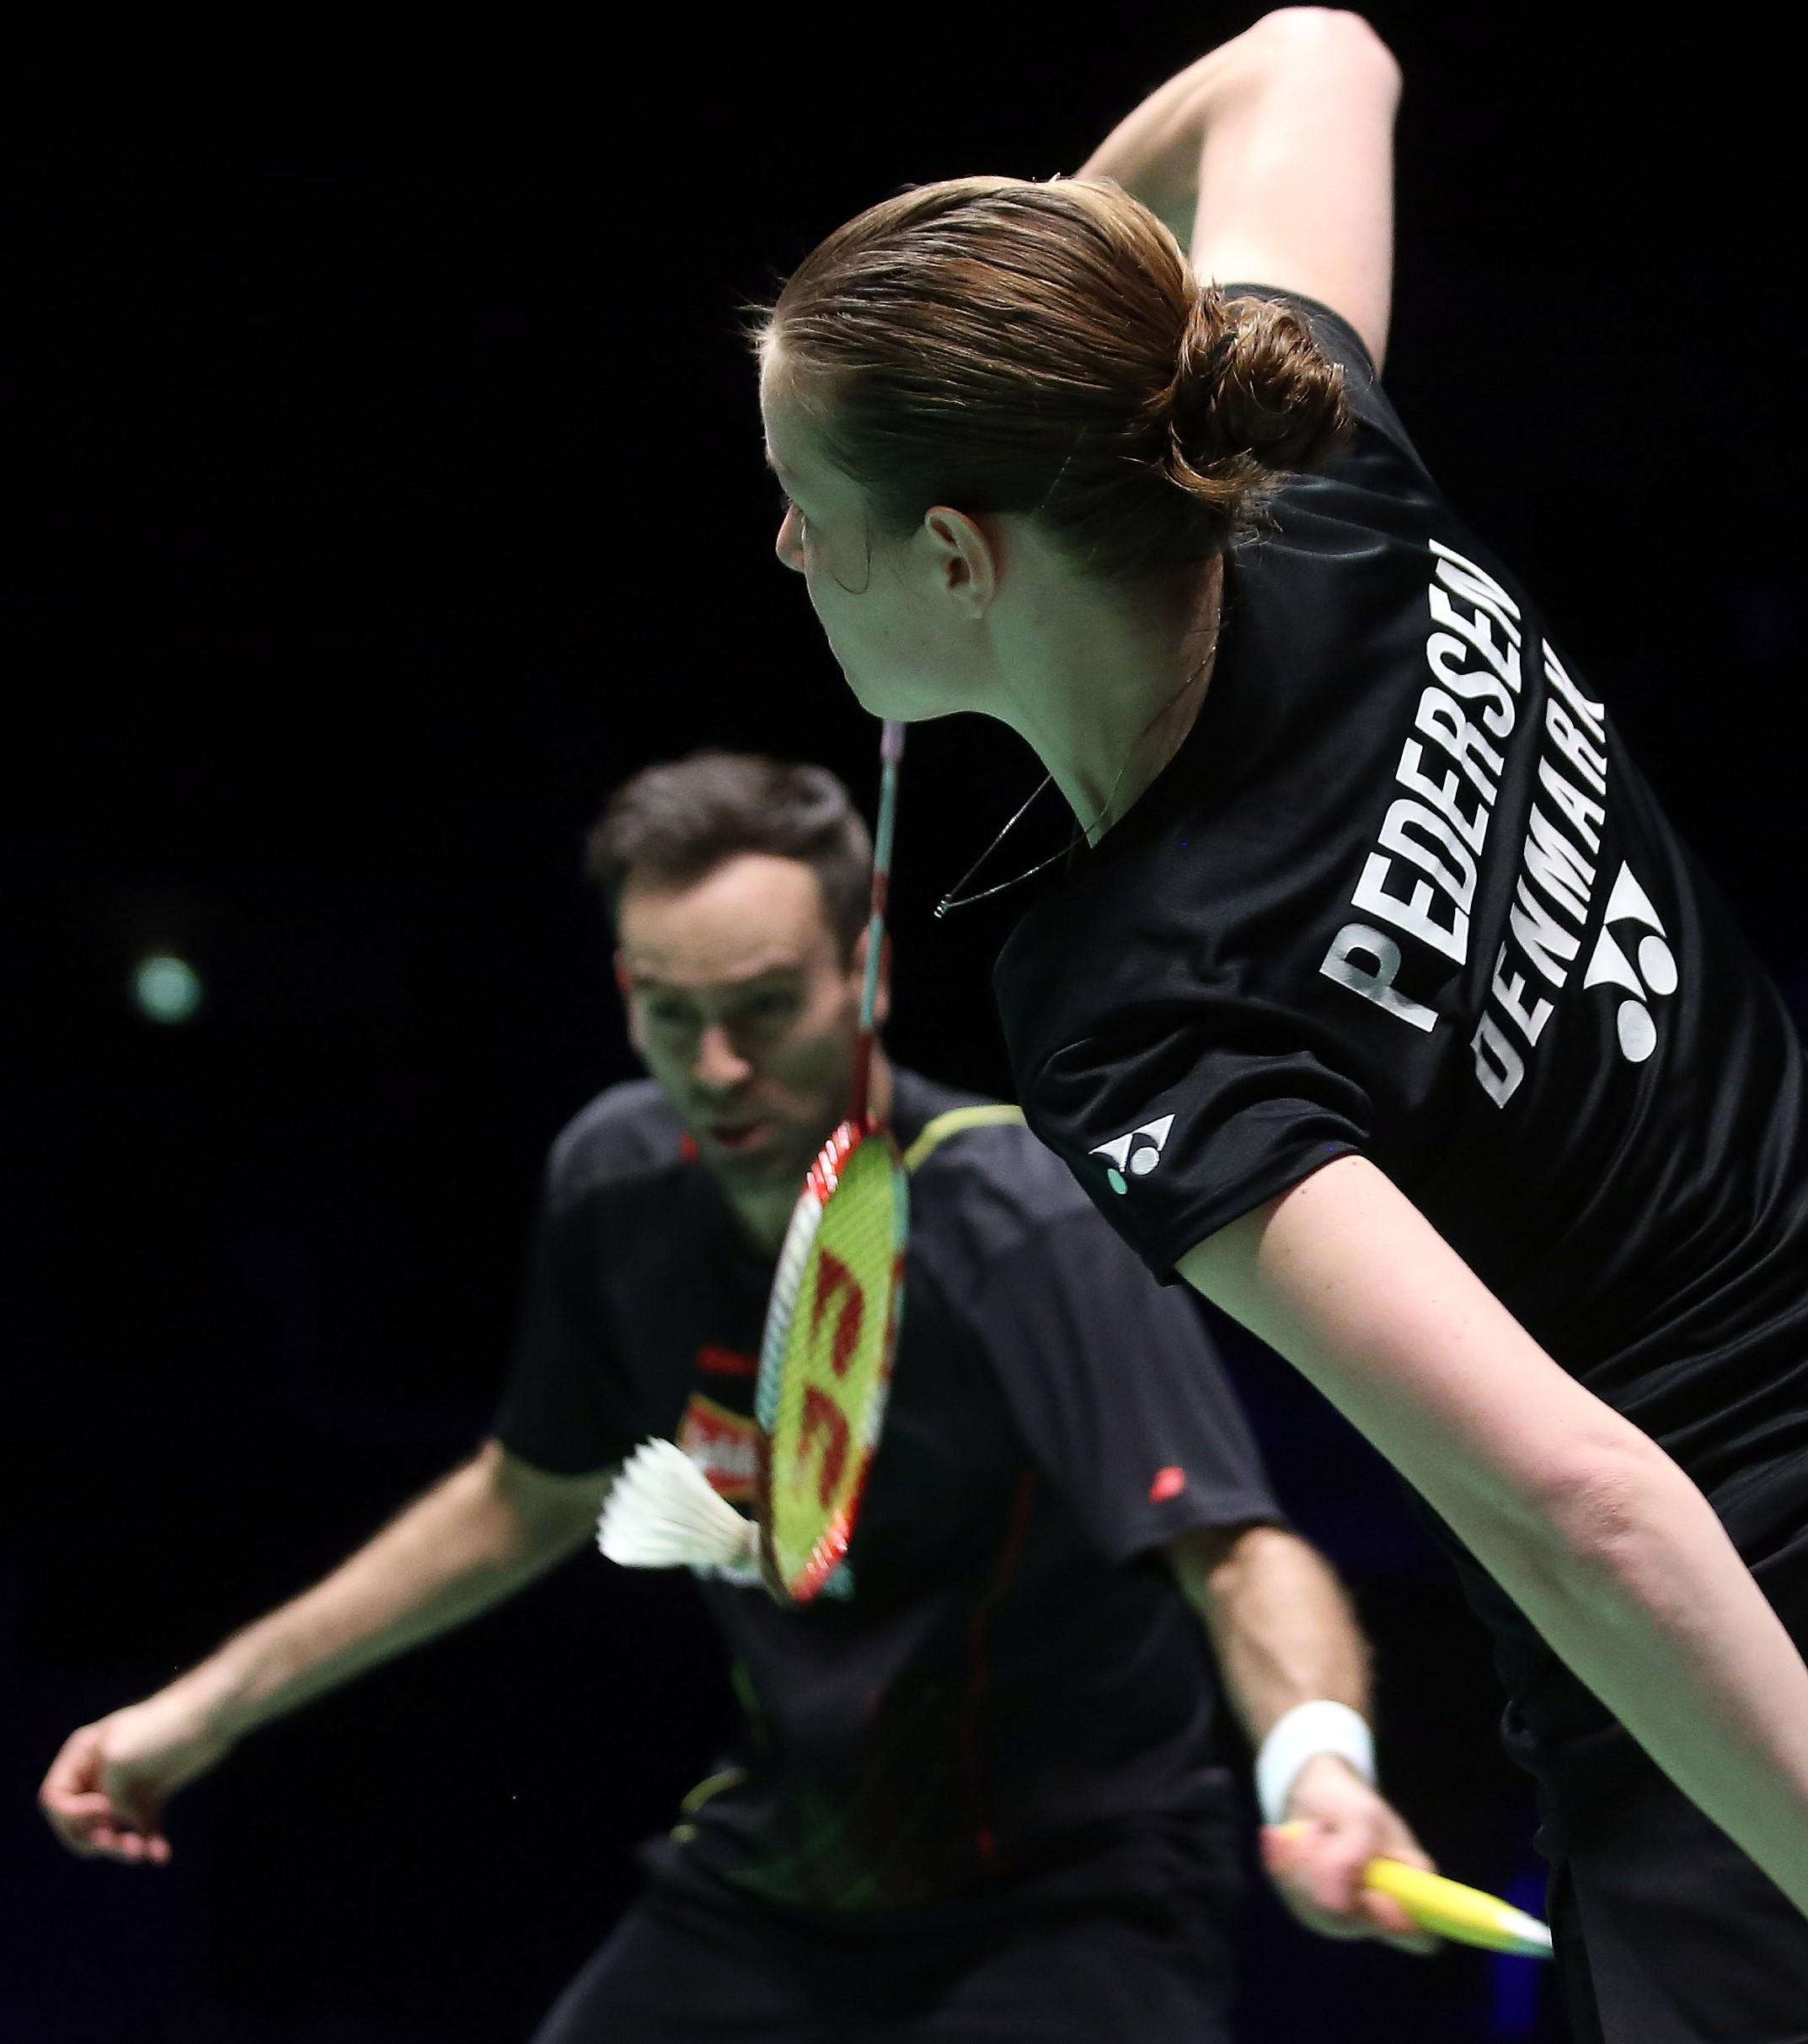 European Champs - Day 6 - Joachim Fischer Nielsen & Christinna Pedersen of Denmark